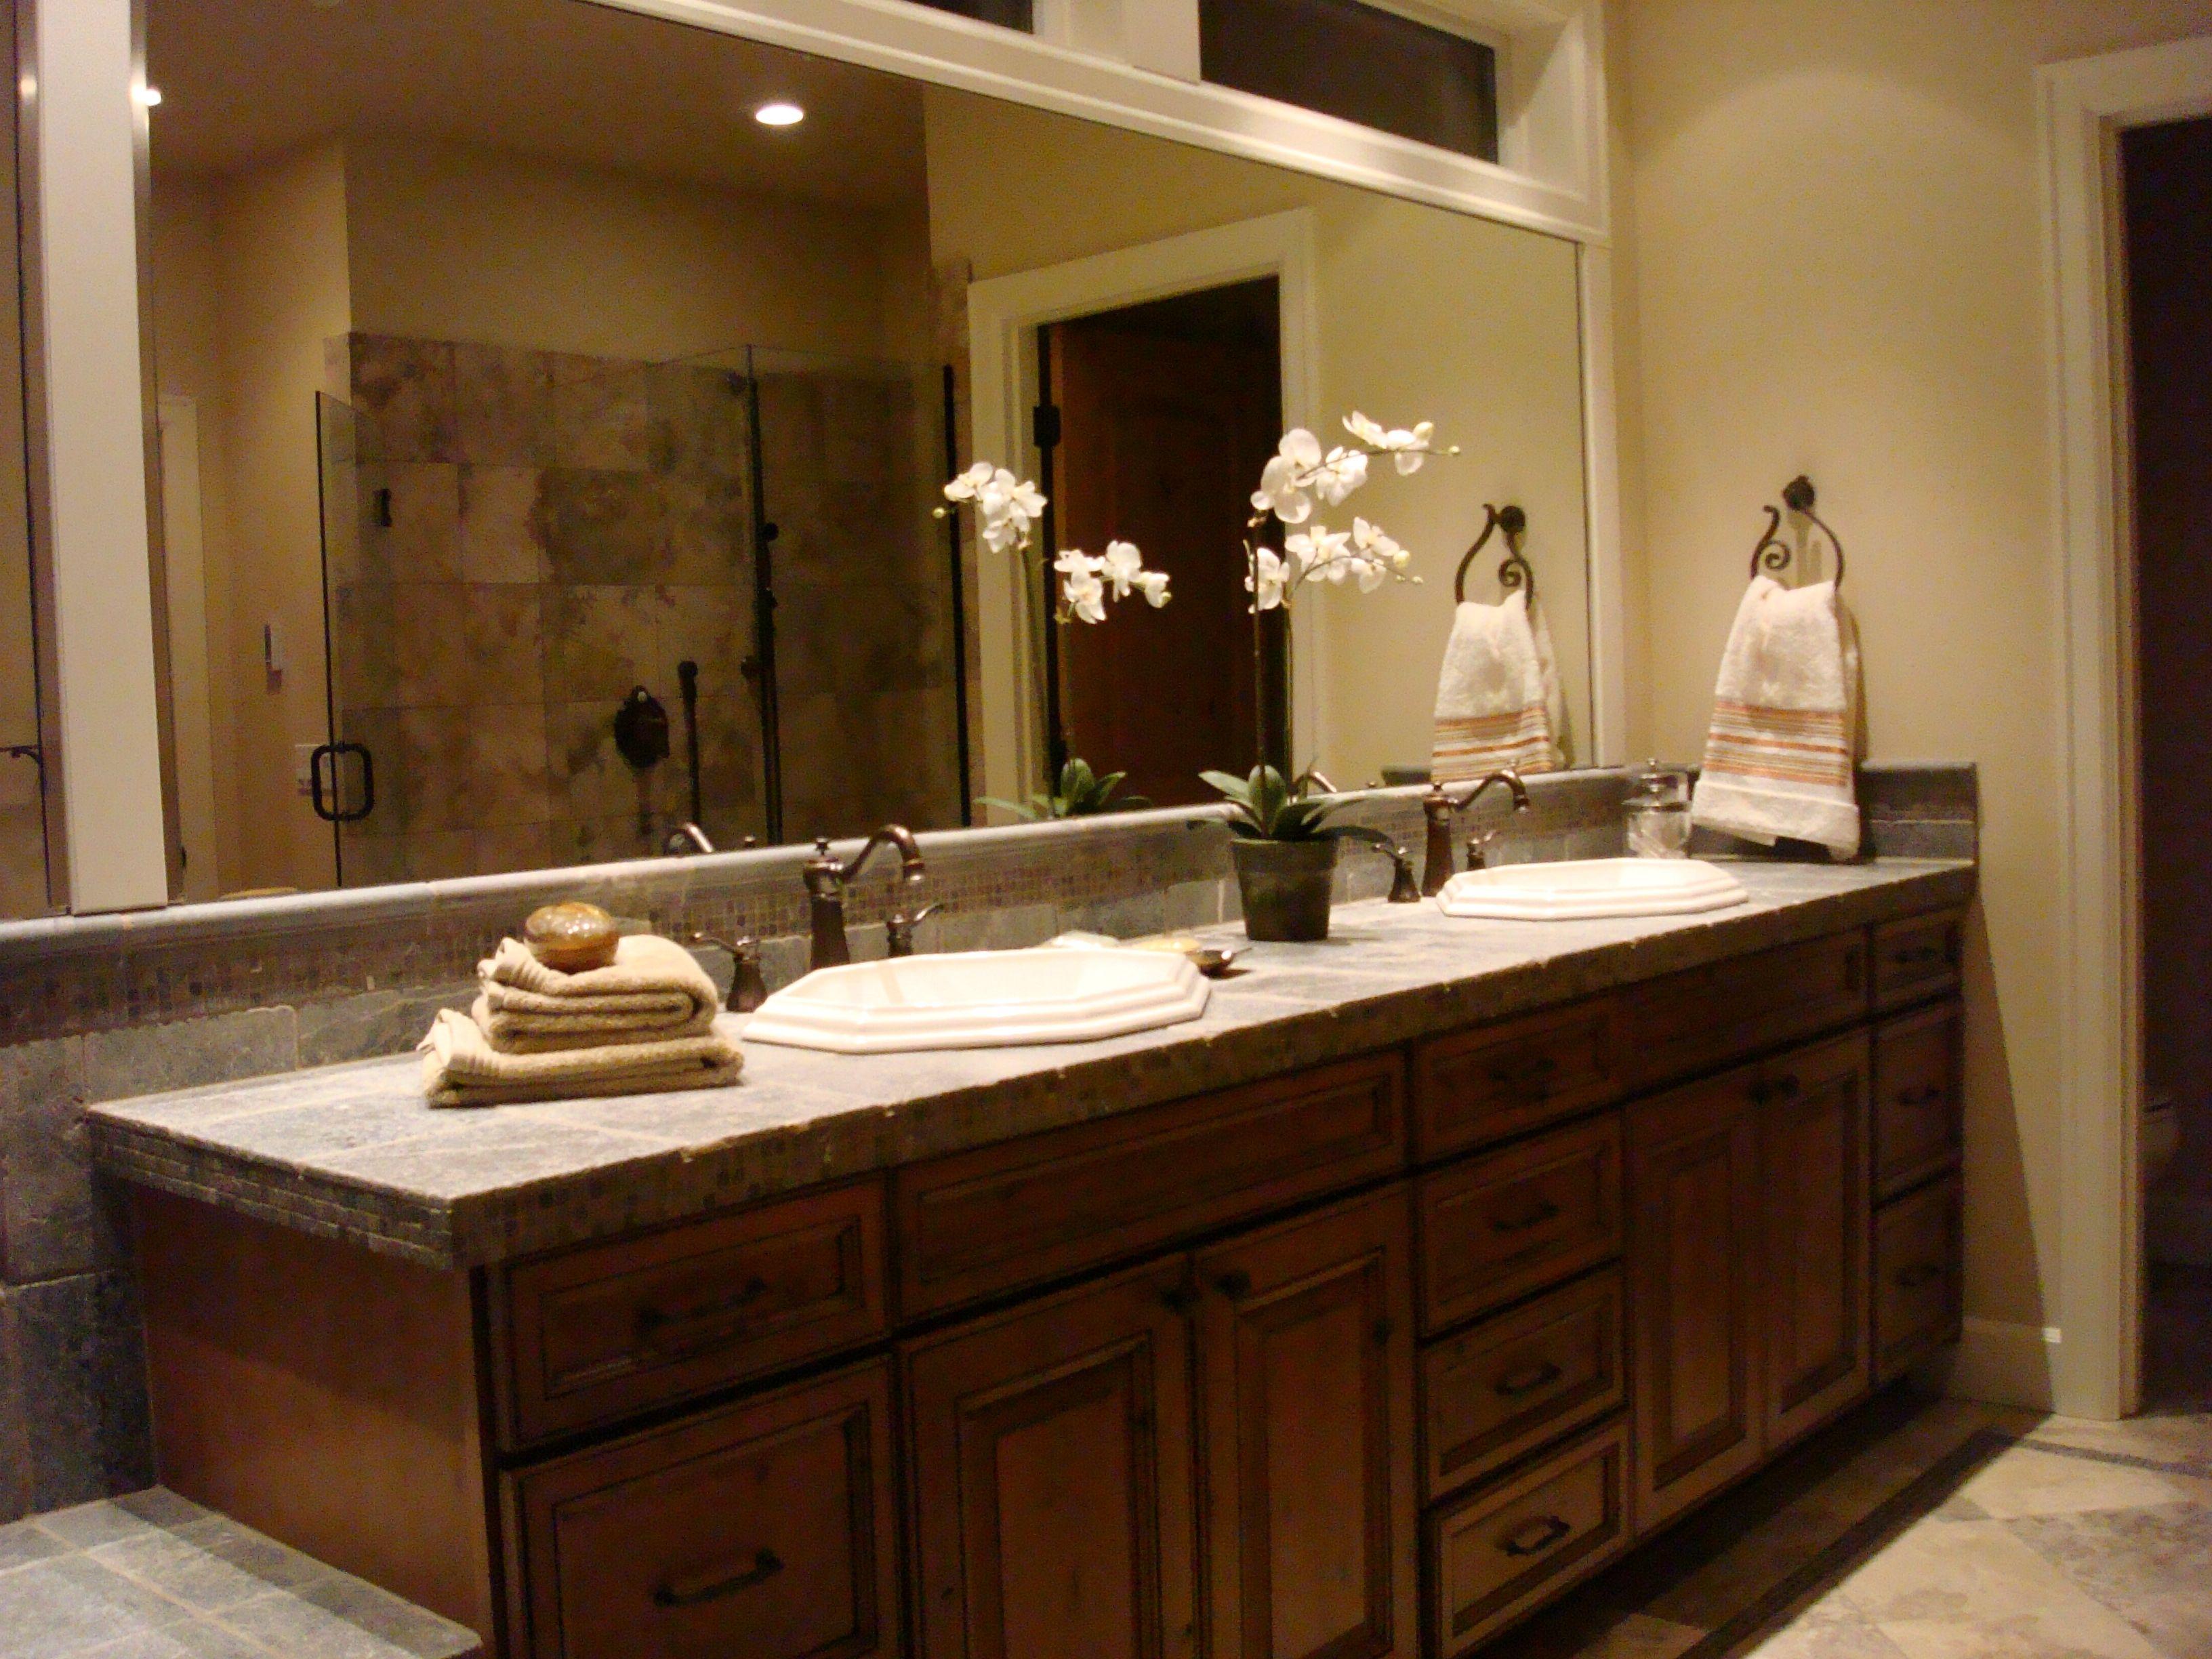 Master Bathroom Double Sink Vanity Ideas Small Bathroom Vanities Master Bath Vanity Bathroom Sink Decor